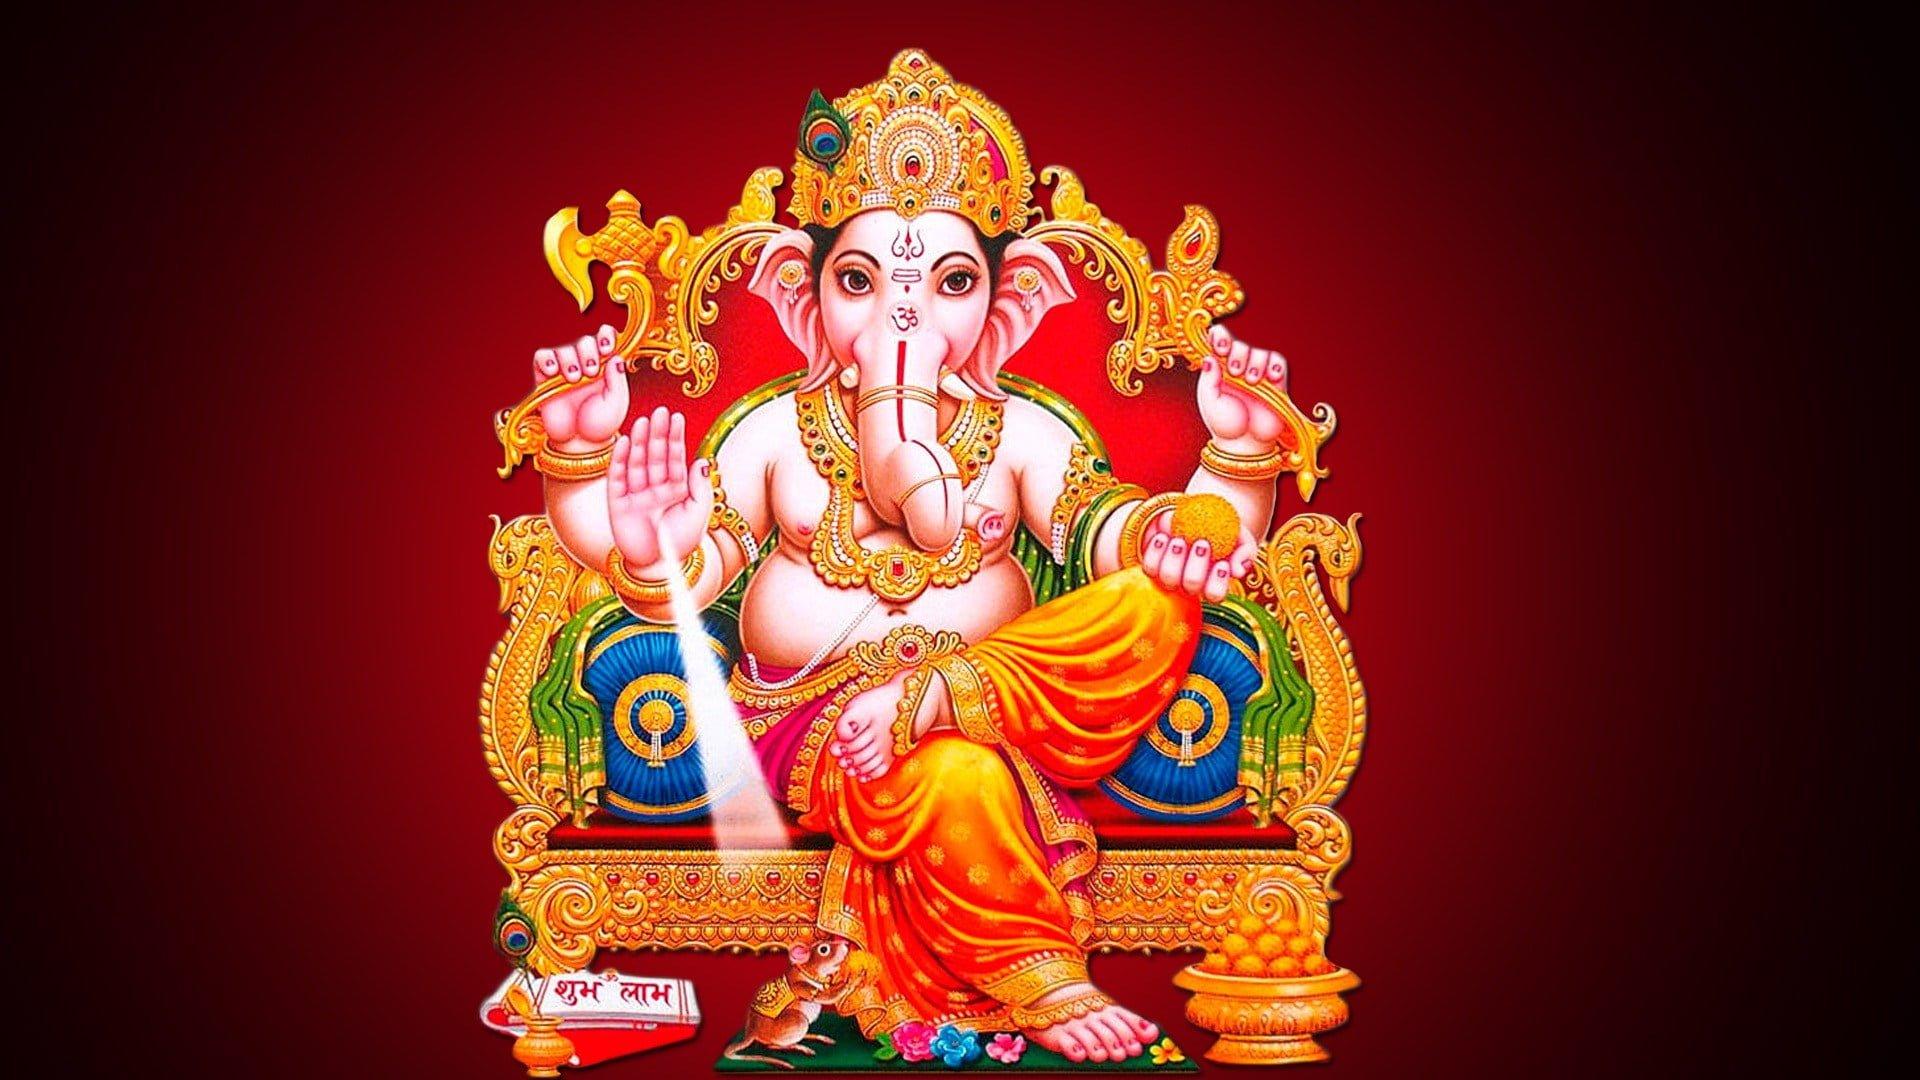 Shri Ganesha HD Photos